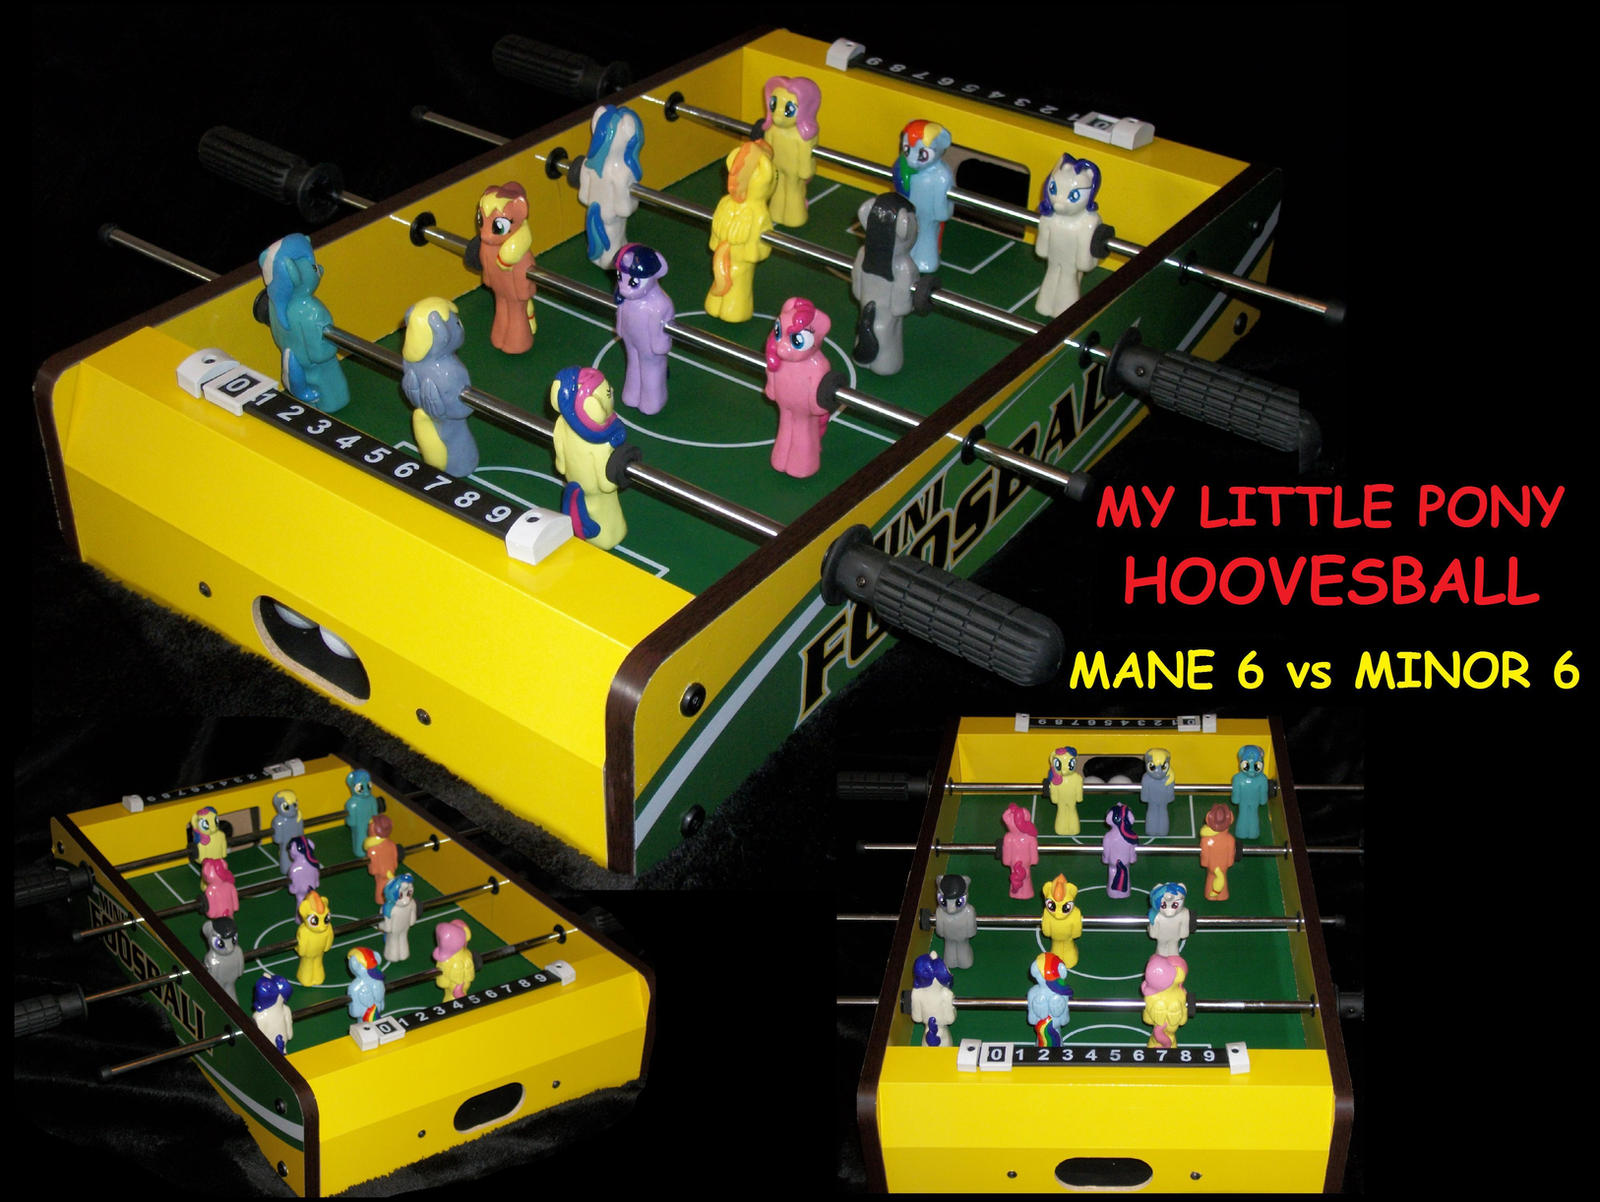 My Little Pony CUSTOM   FOOSBALL GAME !!! by MadPonyScientist